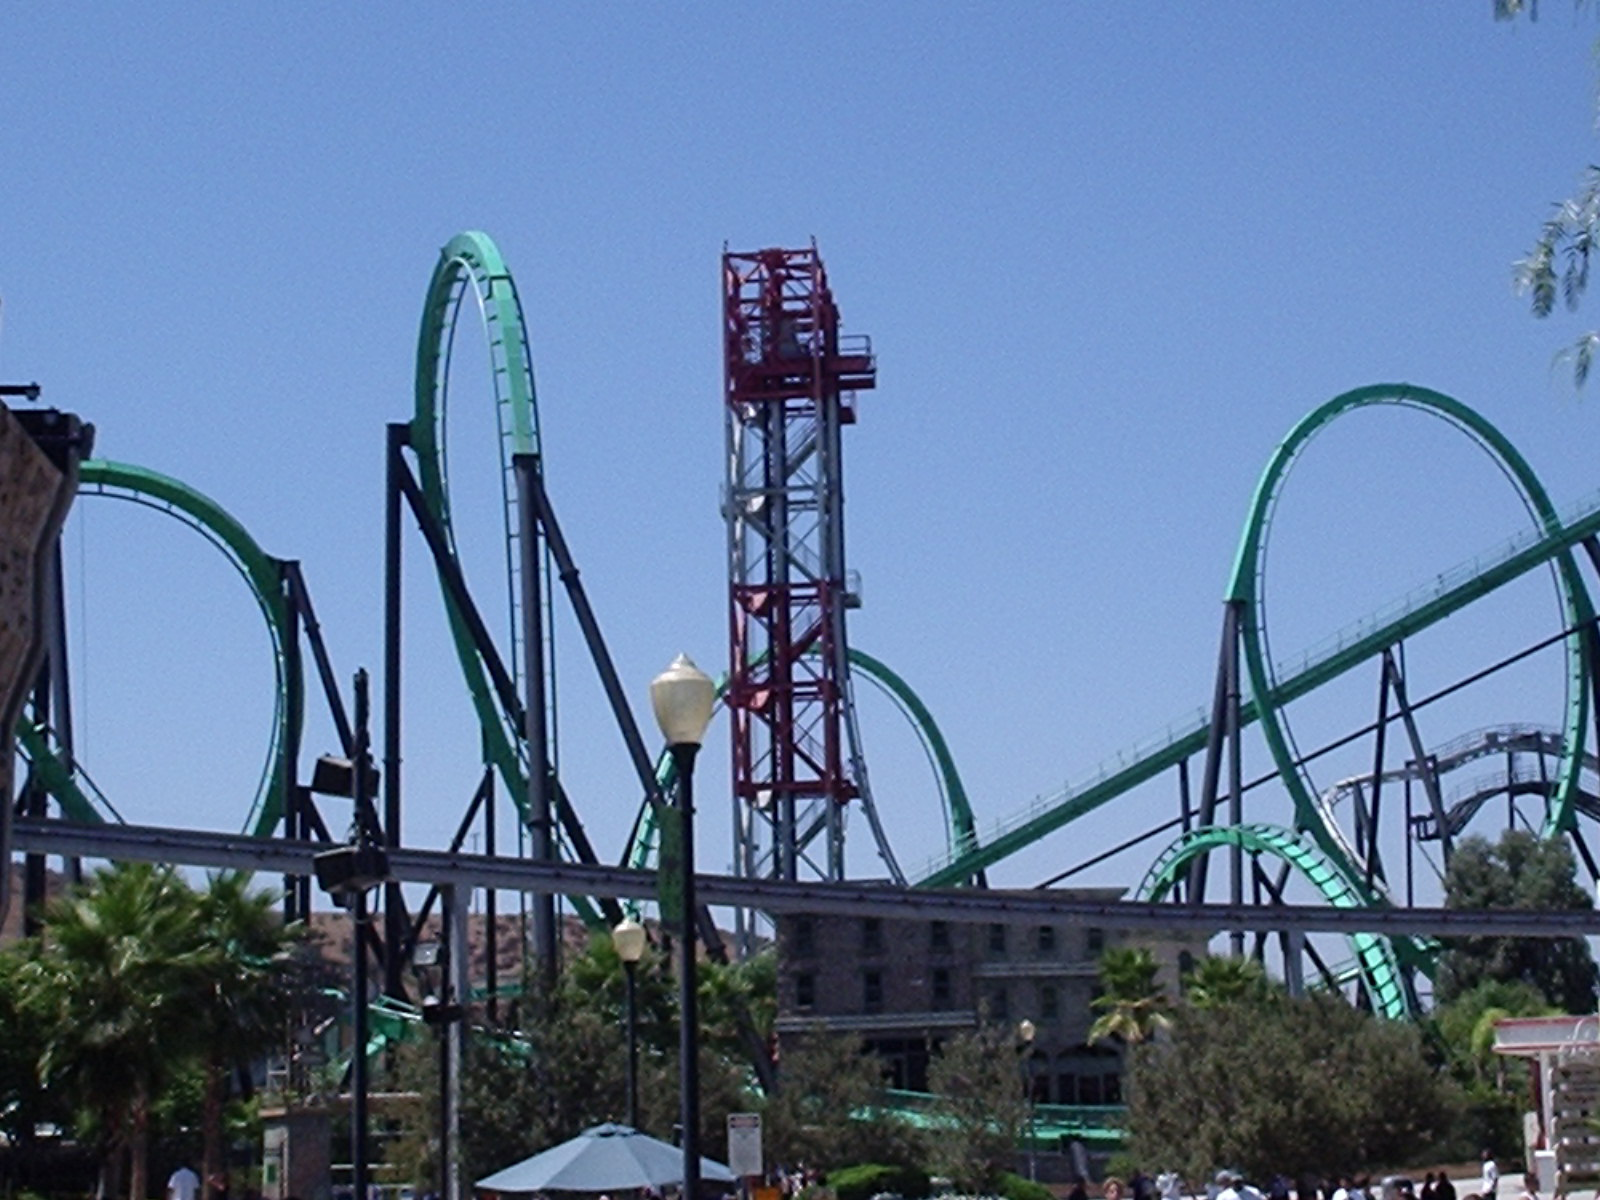 FileFreefall Six Flags Magic Mountainjpg   Wikimedia Commons 1600x1200